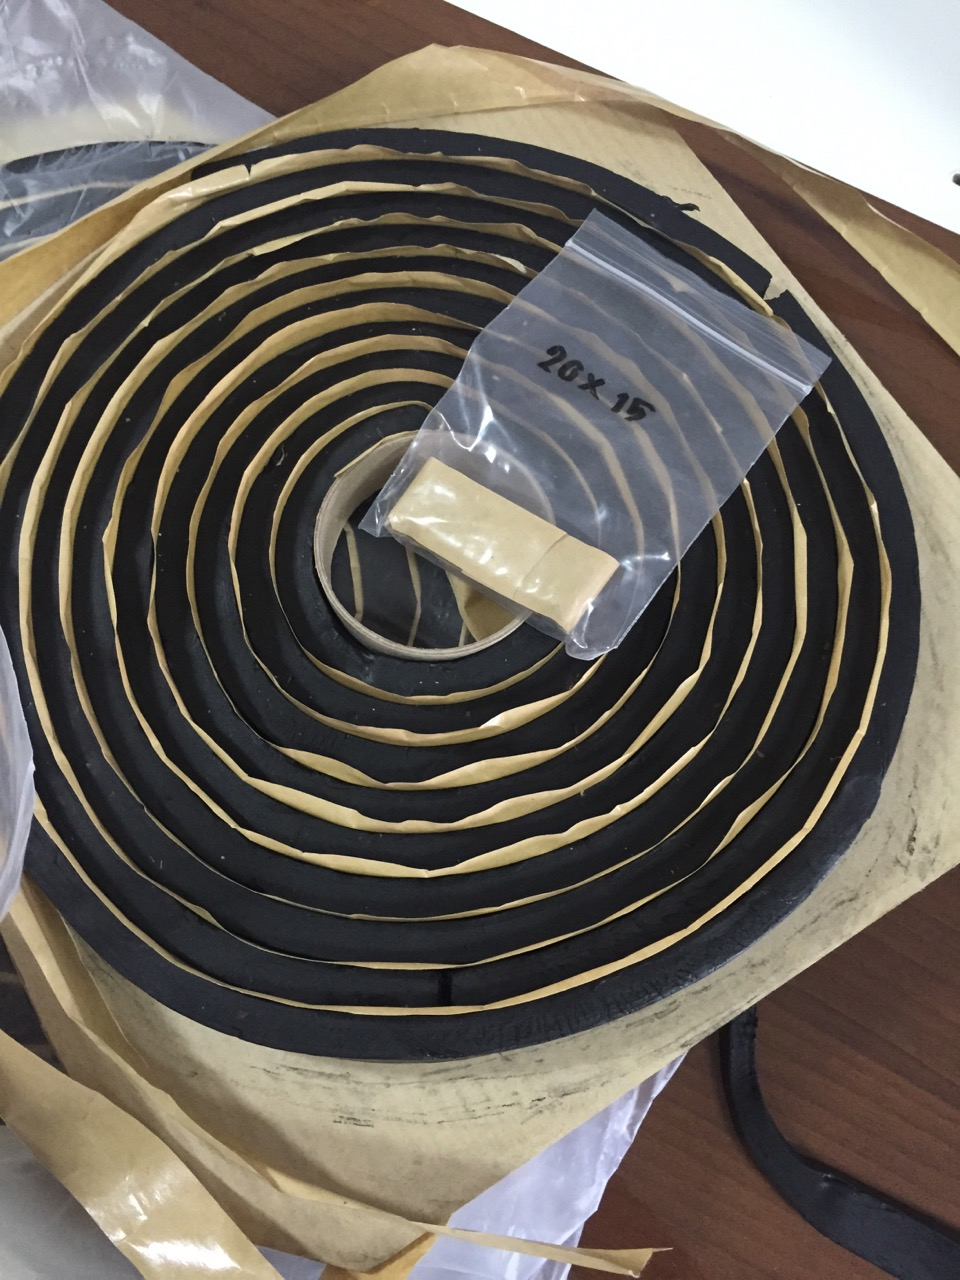 V2025 RHINOSWELL ยางบวมน้ำ (PVC Waterstop Swelling Type) (35 เมตร)